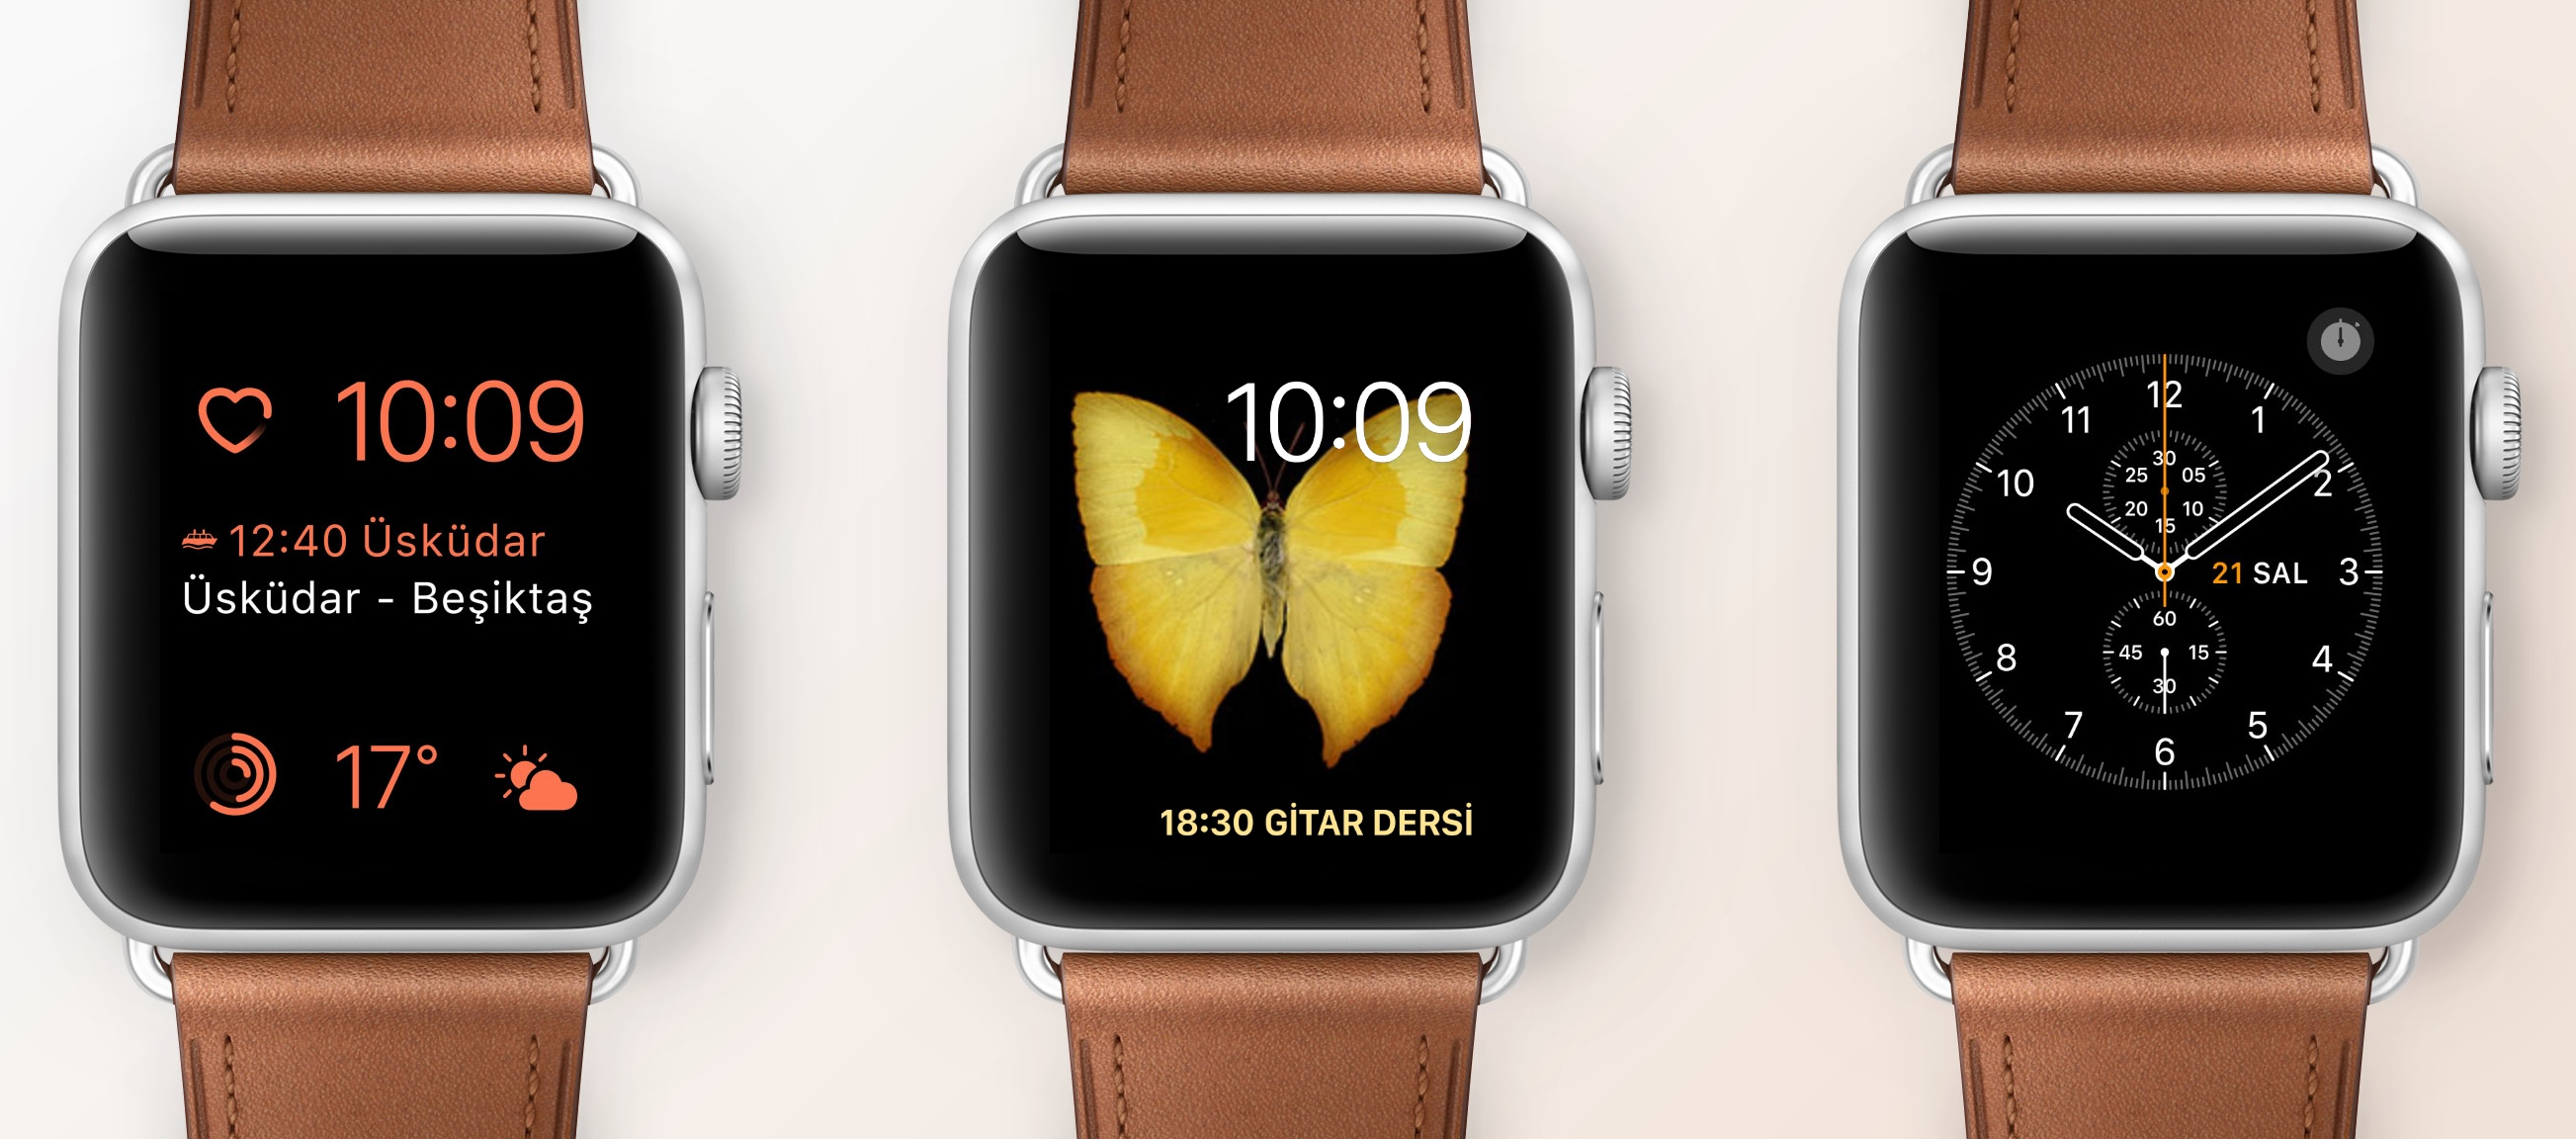 watch-interaktif-galeri-2.jpg